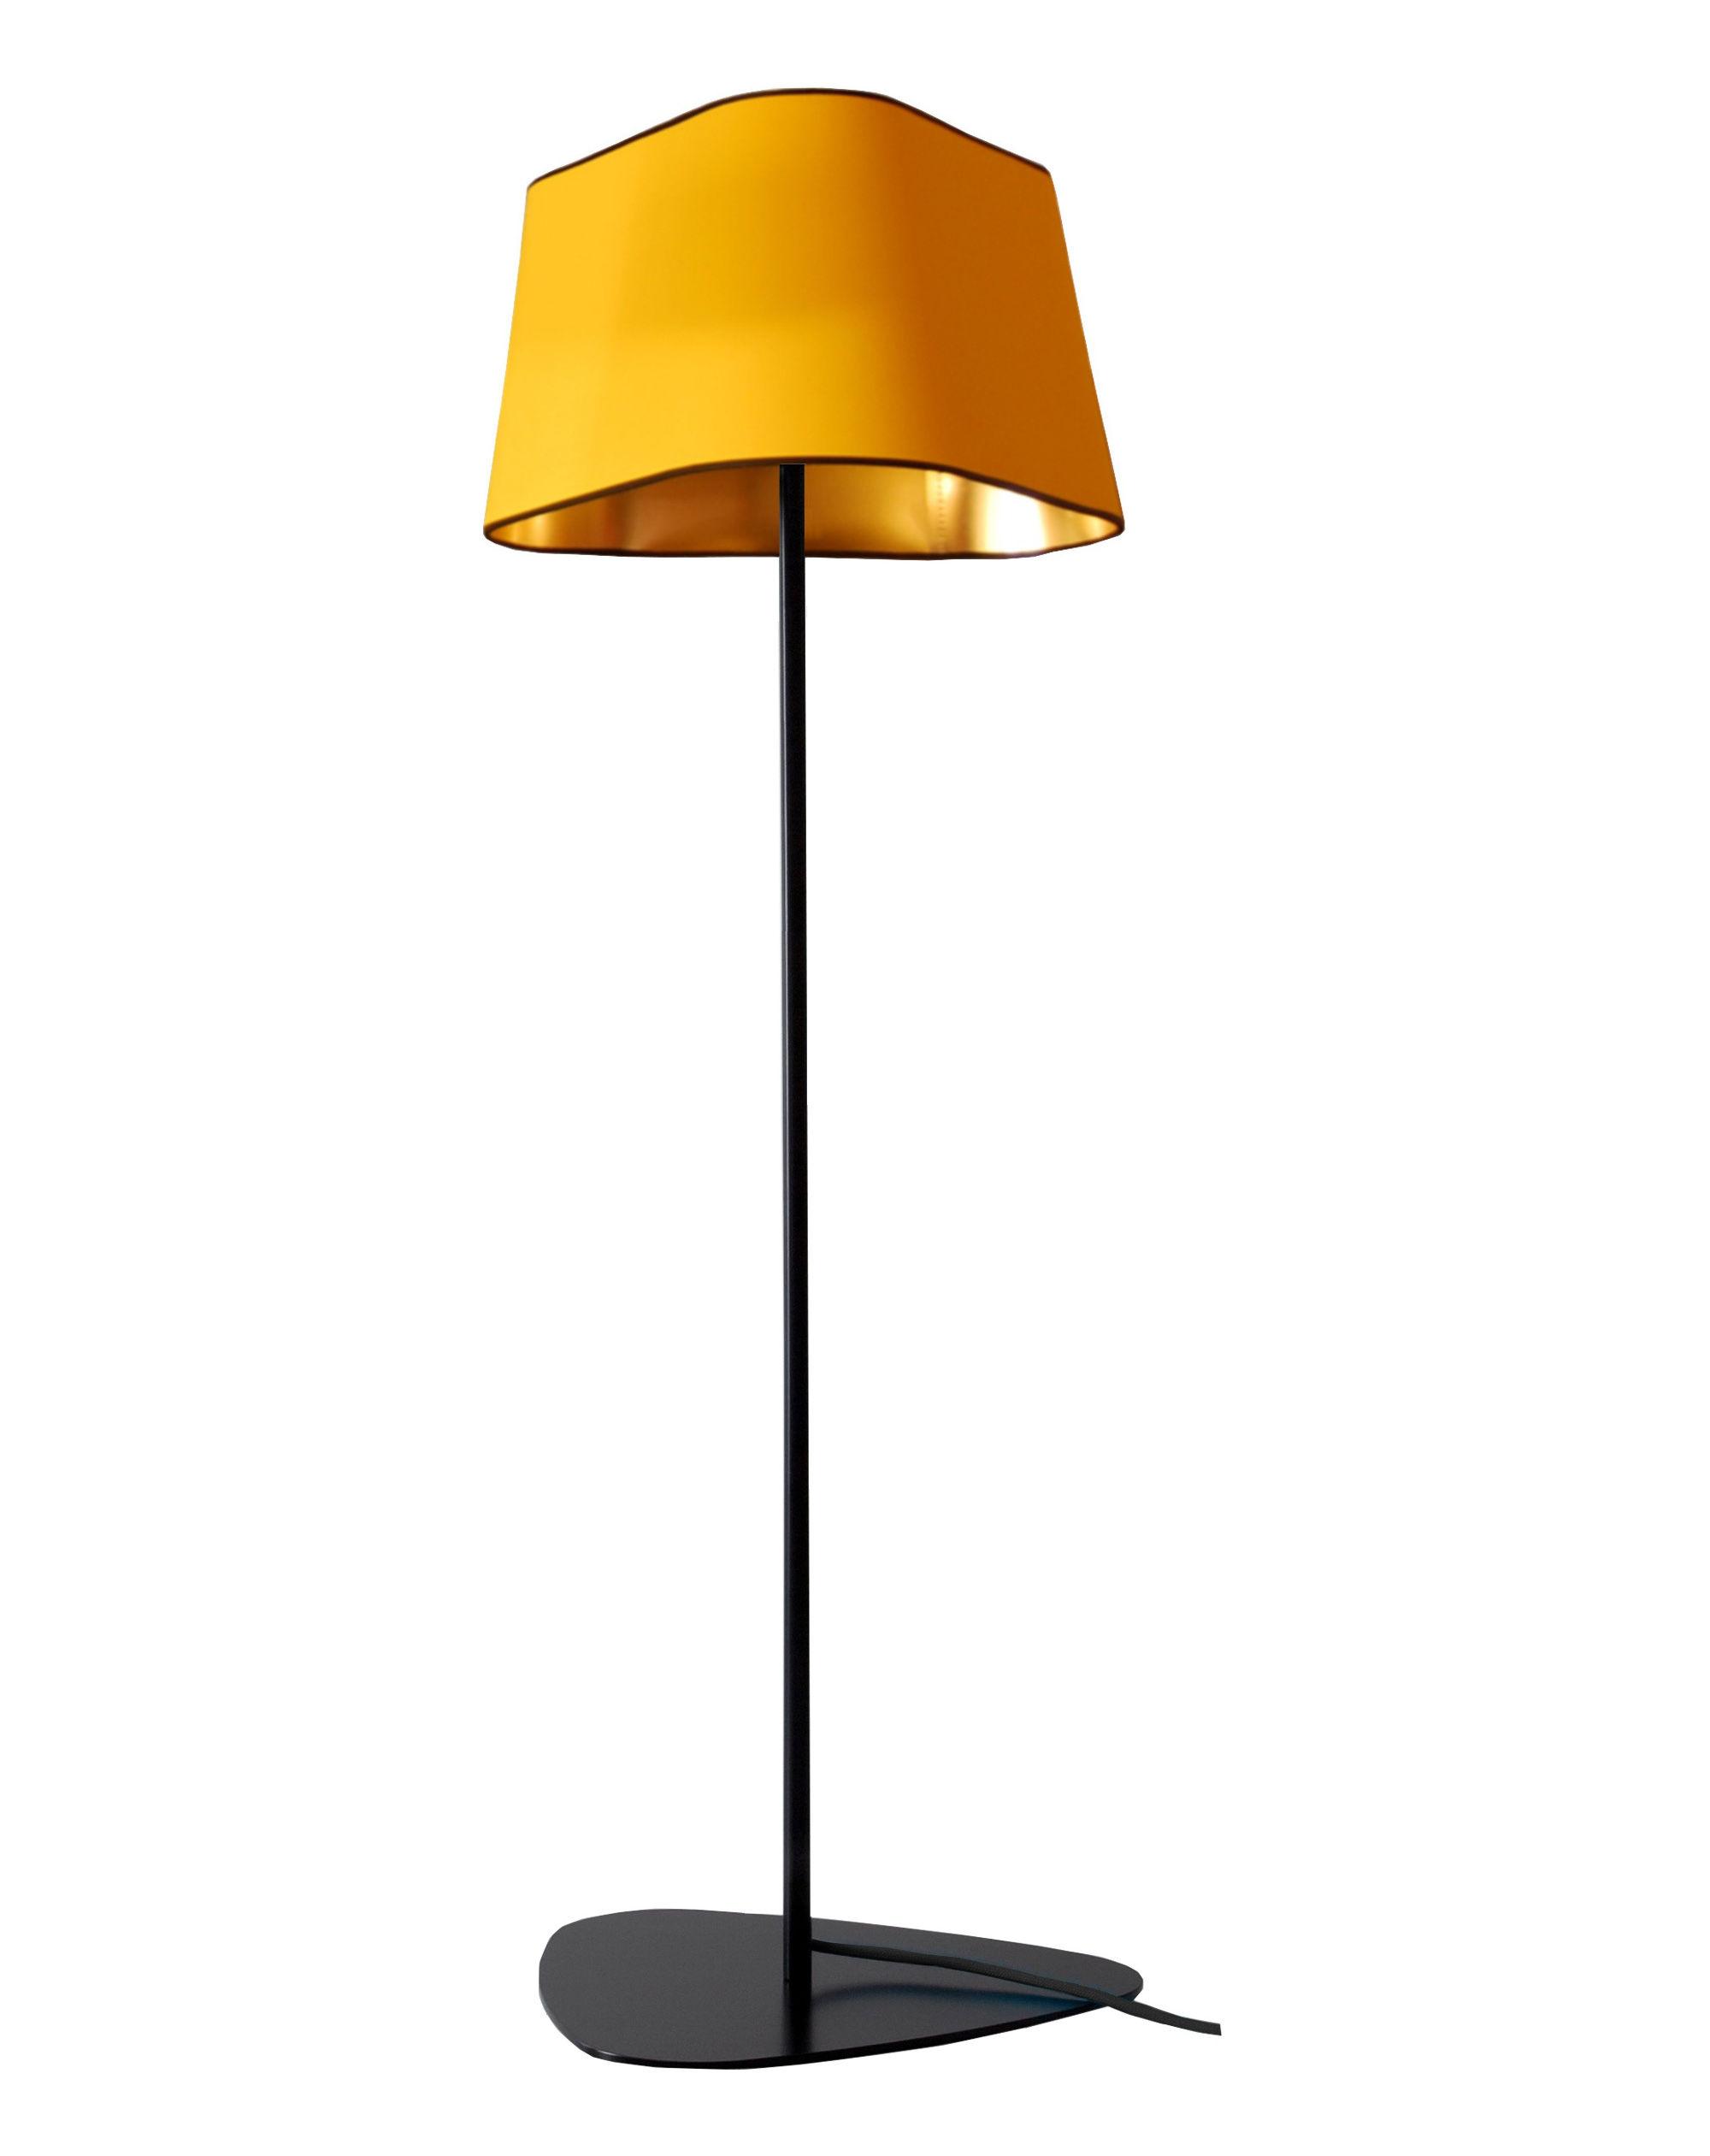 Luminaire - Lampadaires - Lampadaire Grand Nuage H 122 cm - Designheure - Tissu jaune / Intérieur PVC laqué or - Acier laqué, Polycarbonate, Tissu